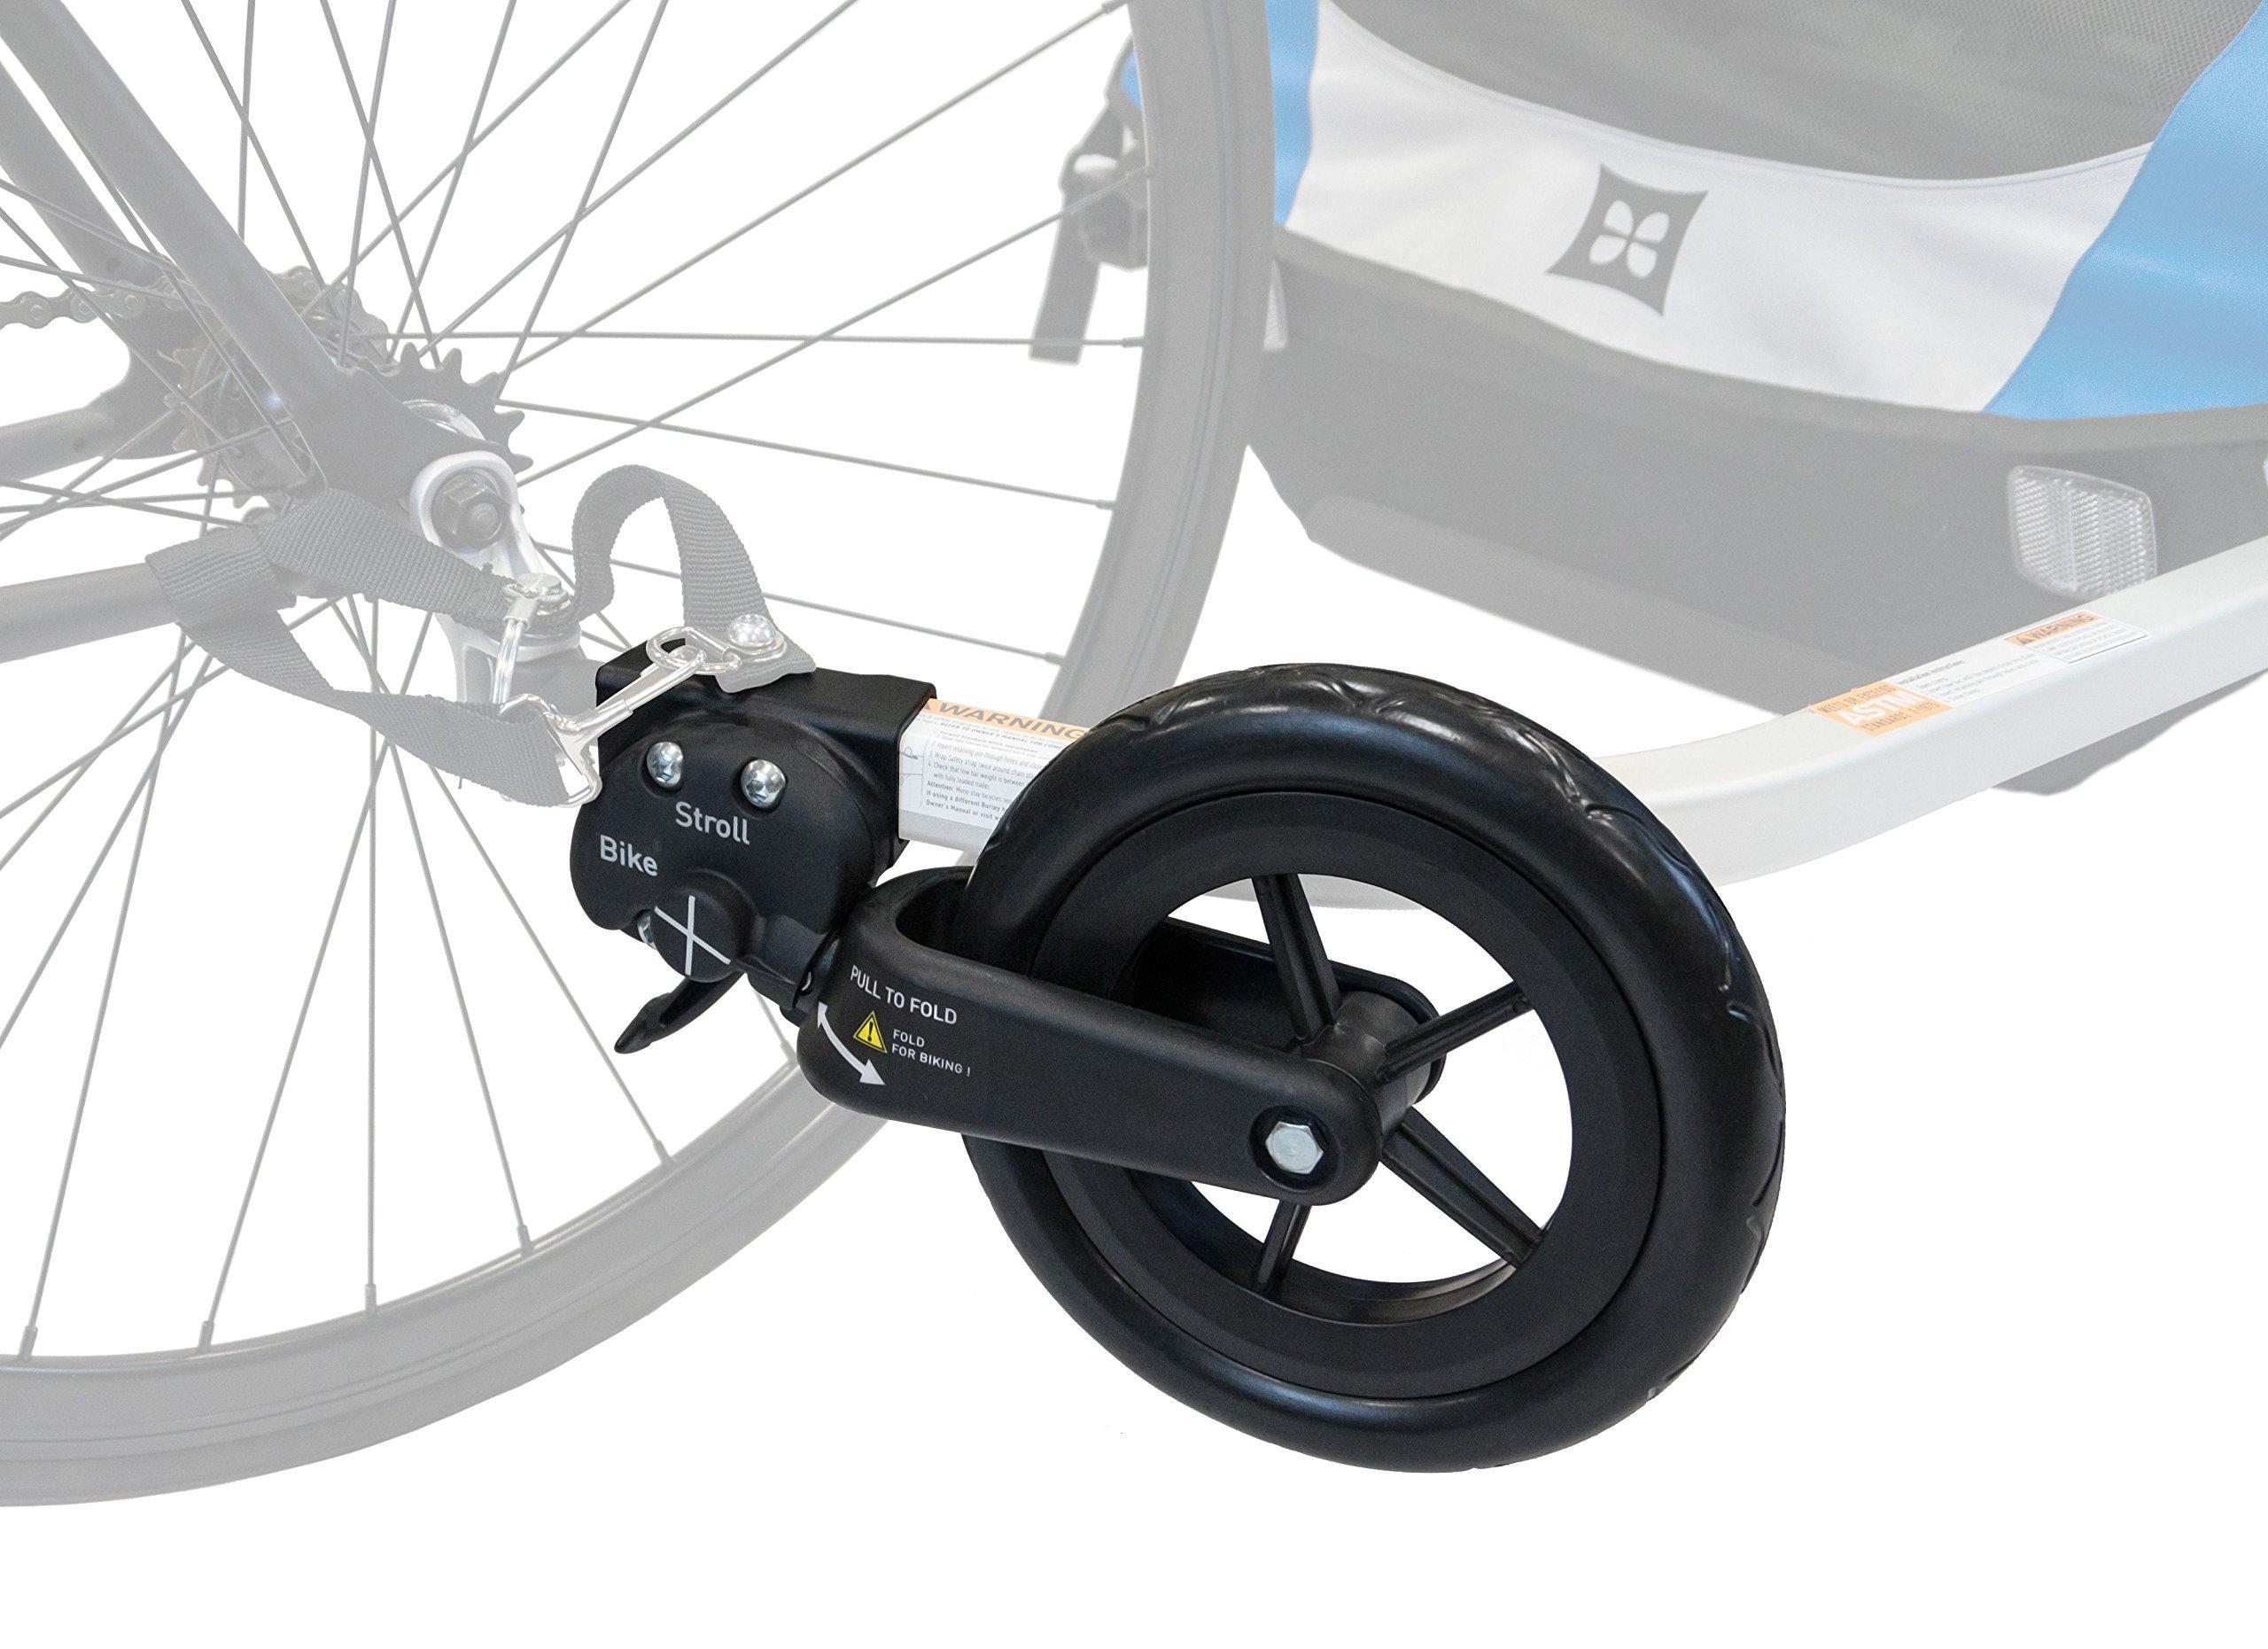 Burley Design One-Wheel Stroller Kit, One Size (Renewed) by Burley Design (Image #2)